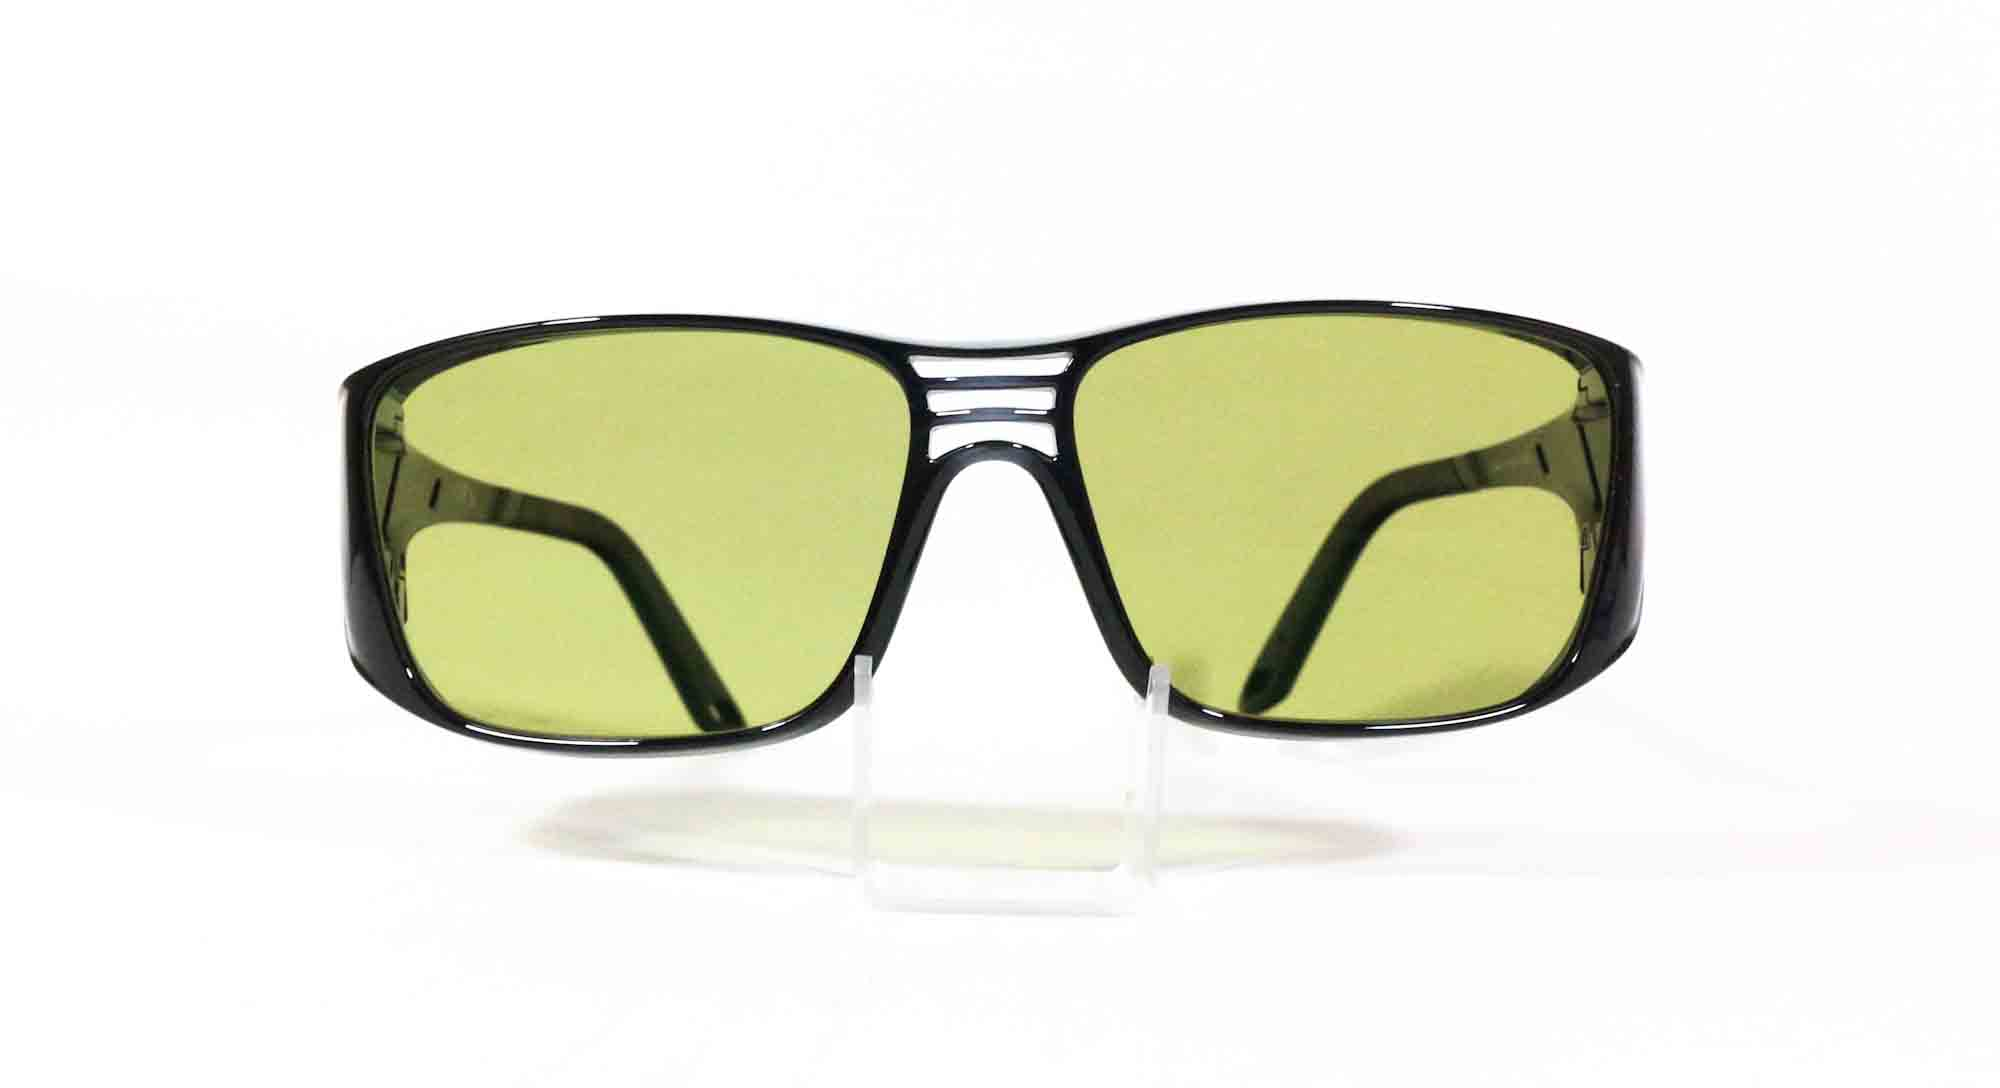 Zeal Polarised Fishing Sunglasses Opa F-1905 Ease Green / Gray (8614)